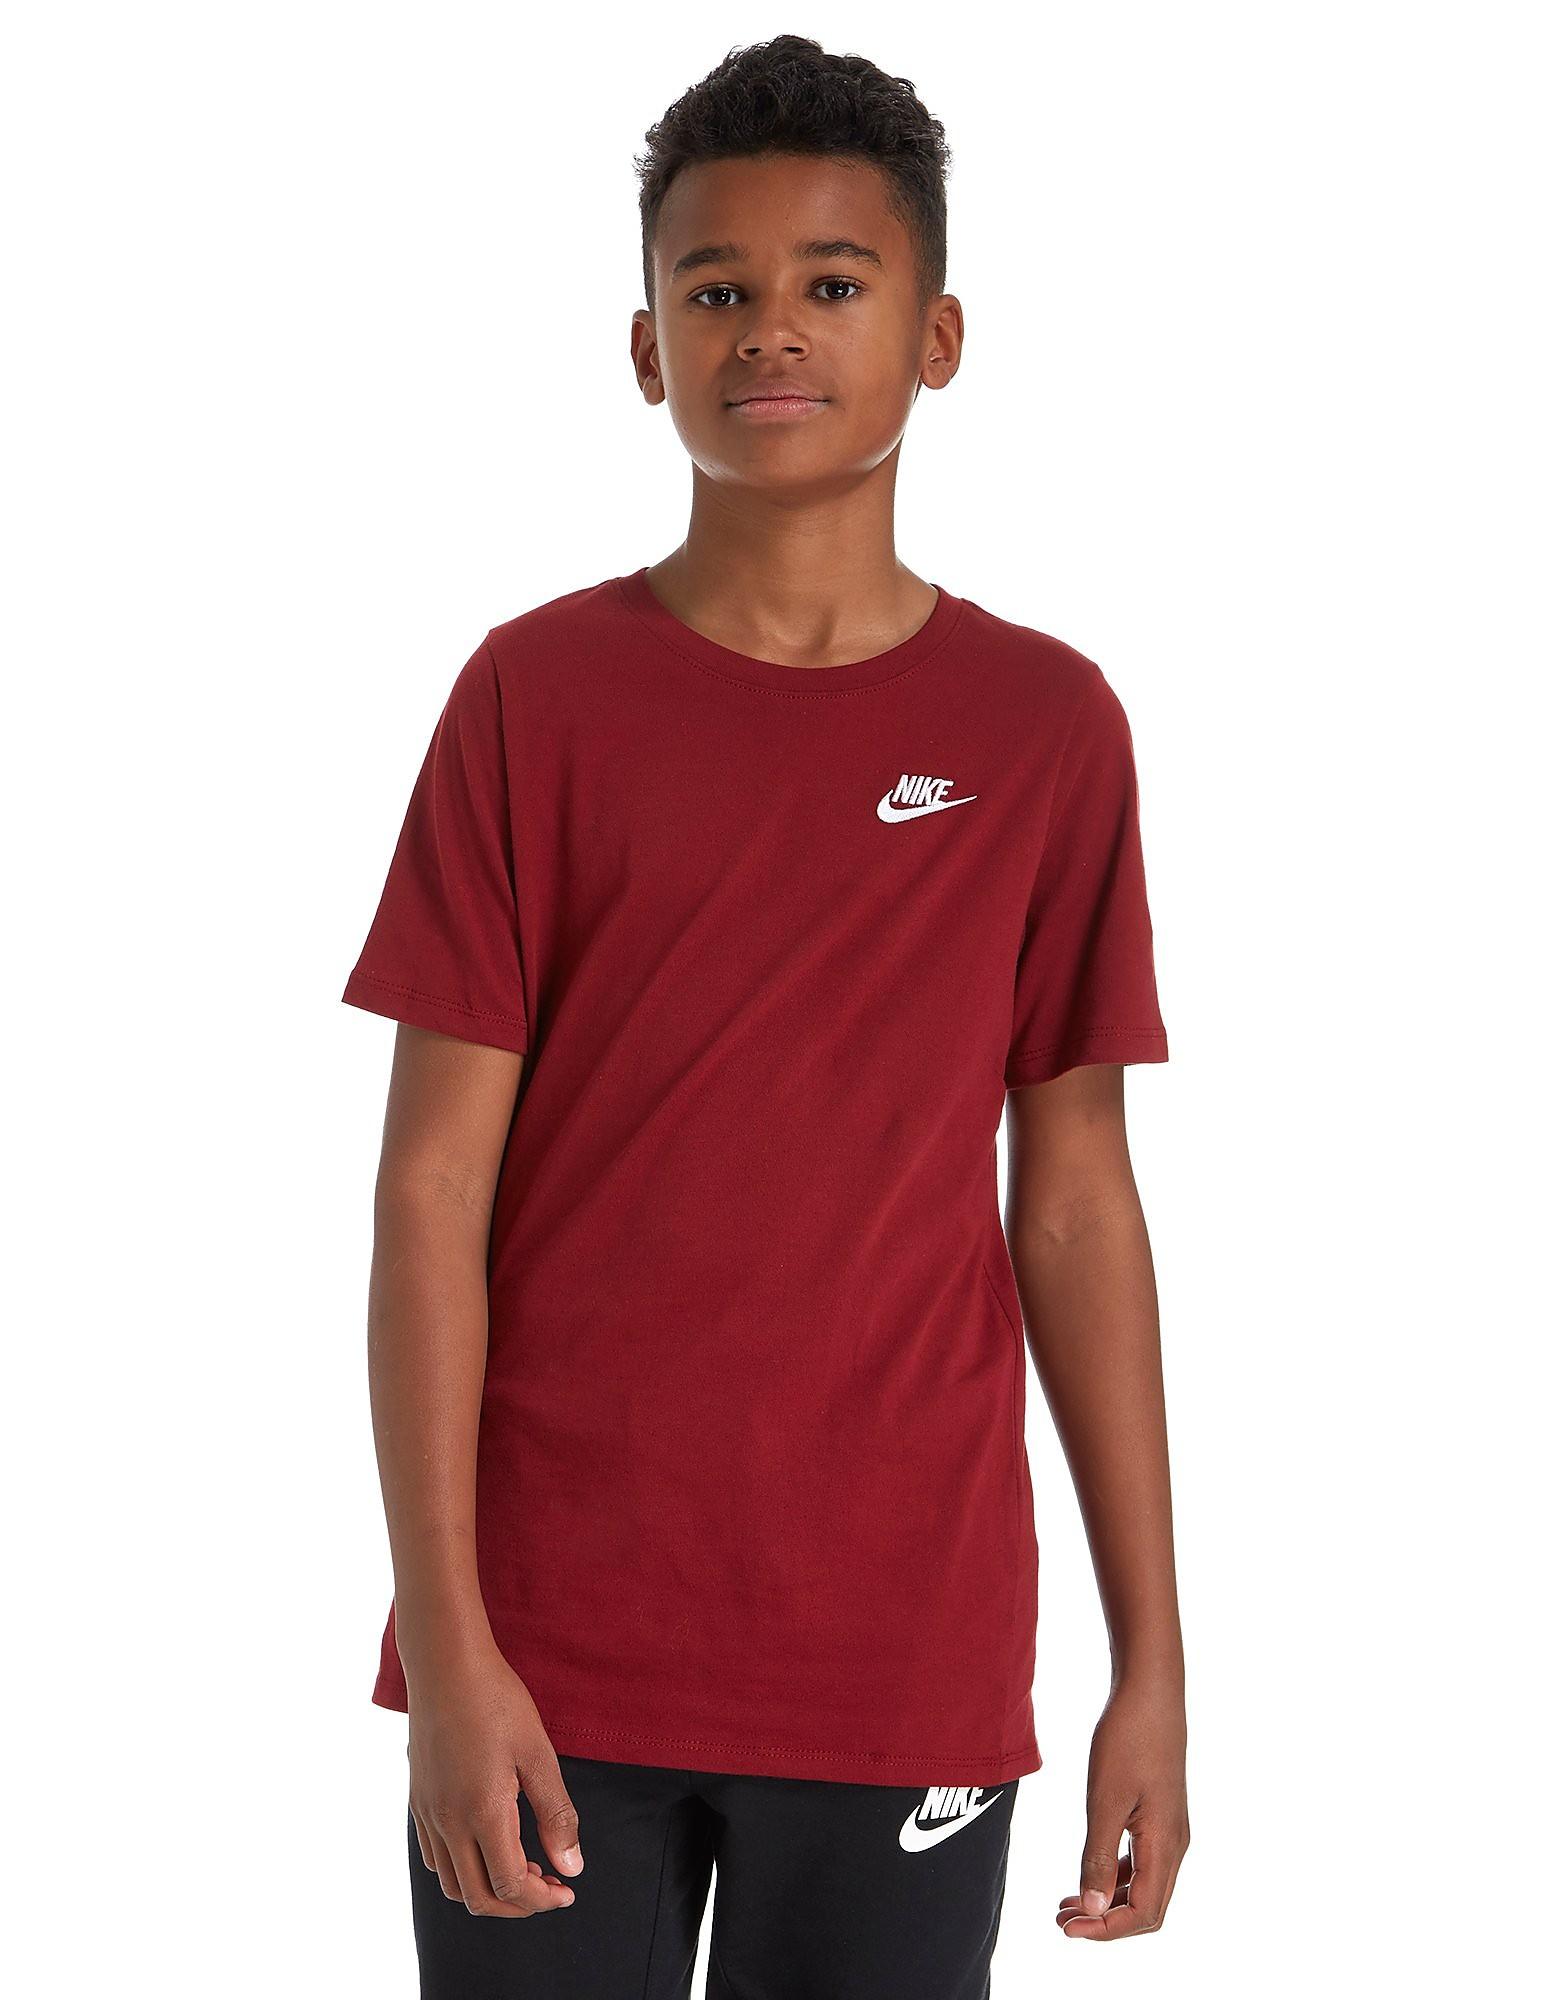 Nike Franchise T-Shirt Junior - rouge/blanc, rouge/blanc